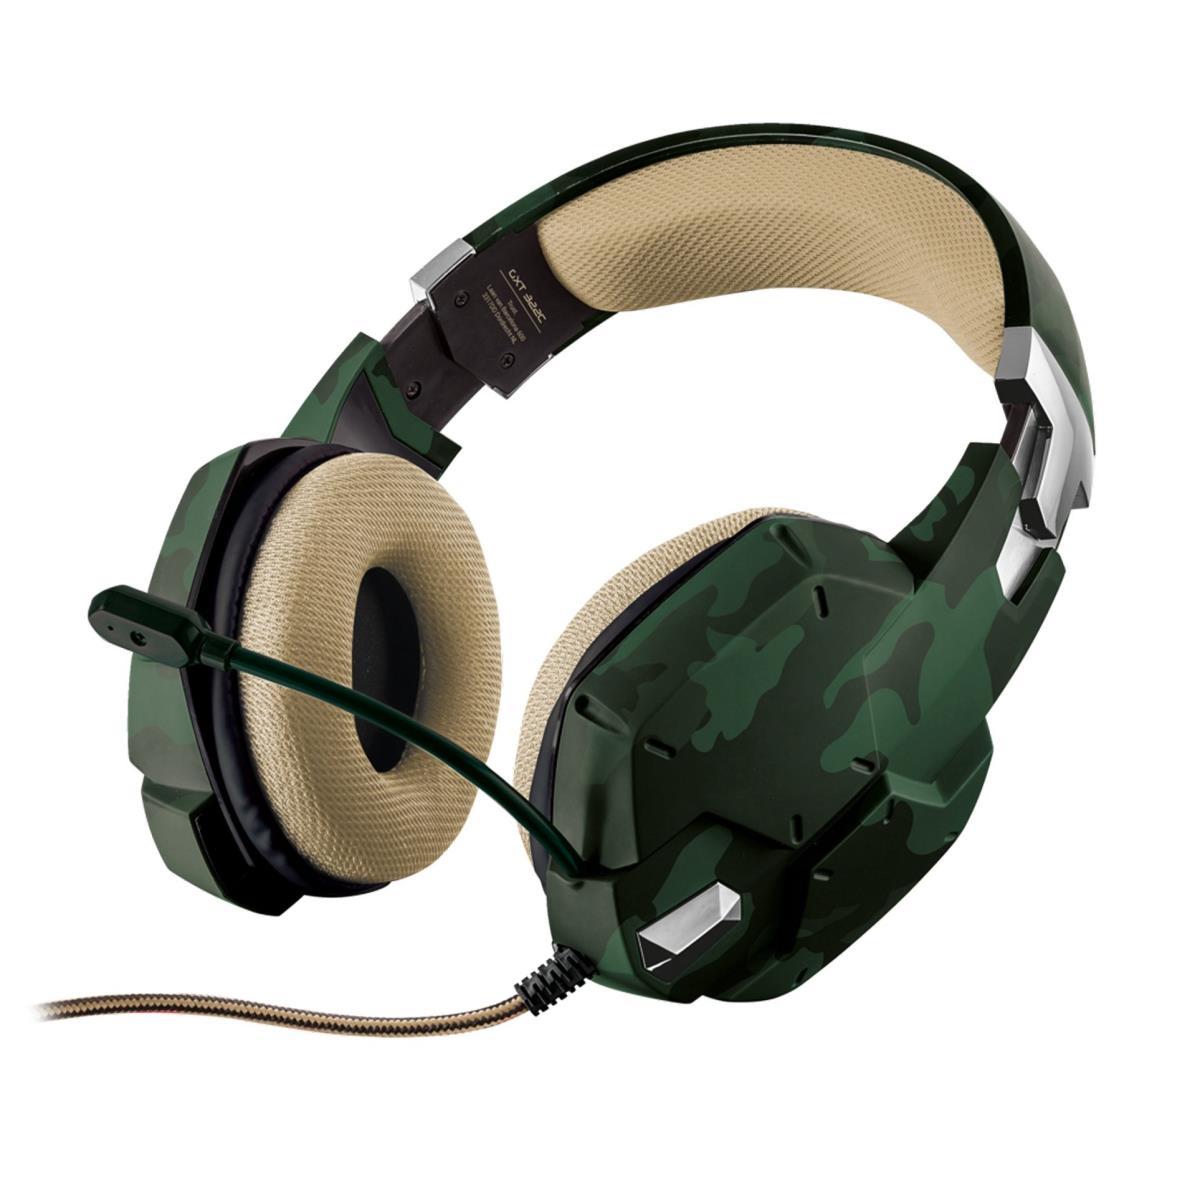 Gamingkopfhörer Headset Kopfhörer Stereo mit Mikrofon ,Trust,GXT 322C, 8713439208658